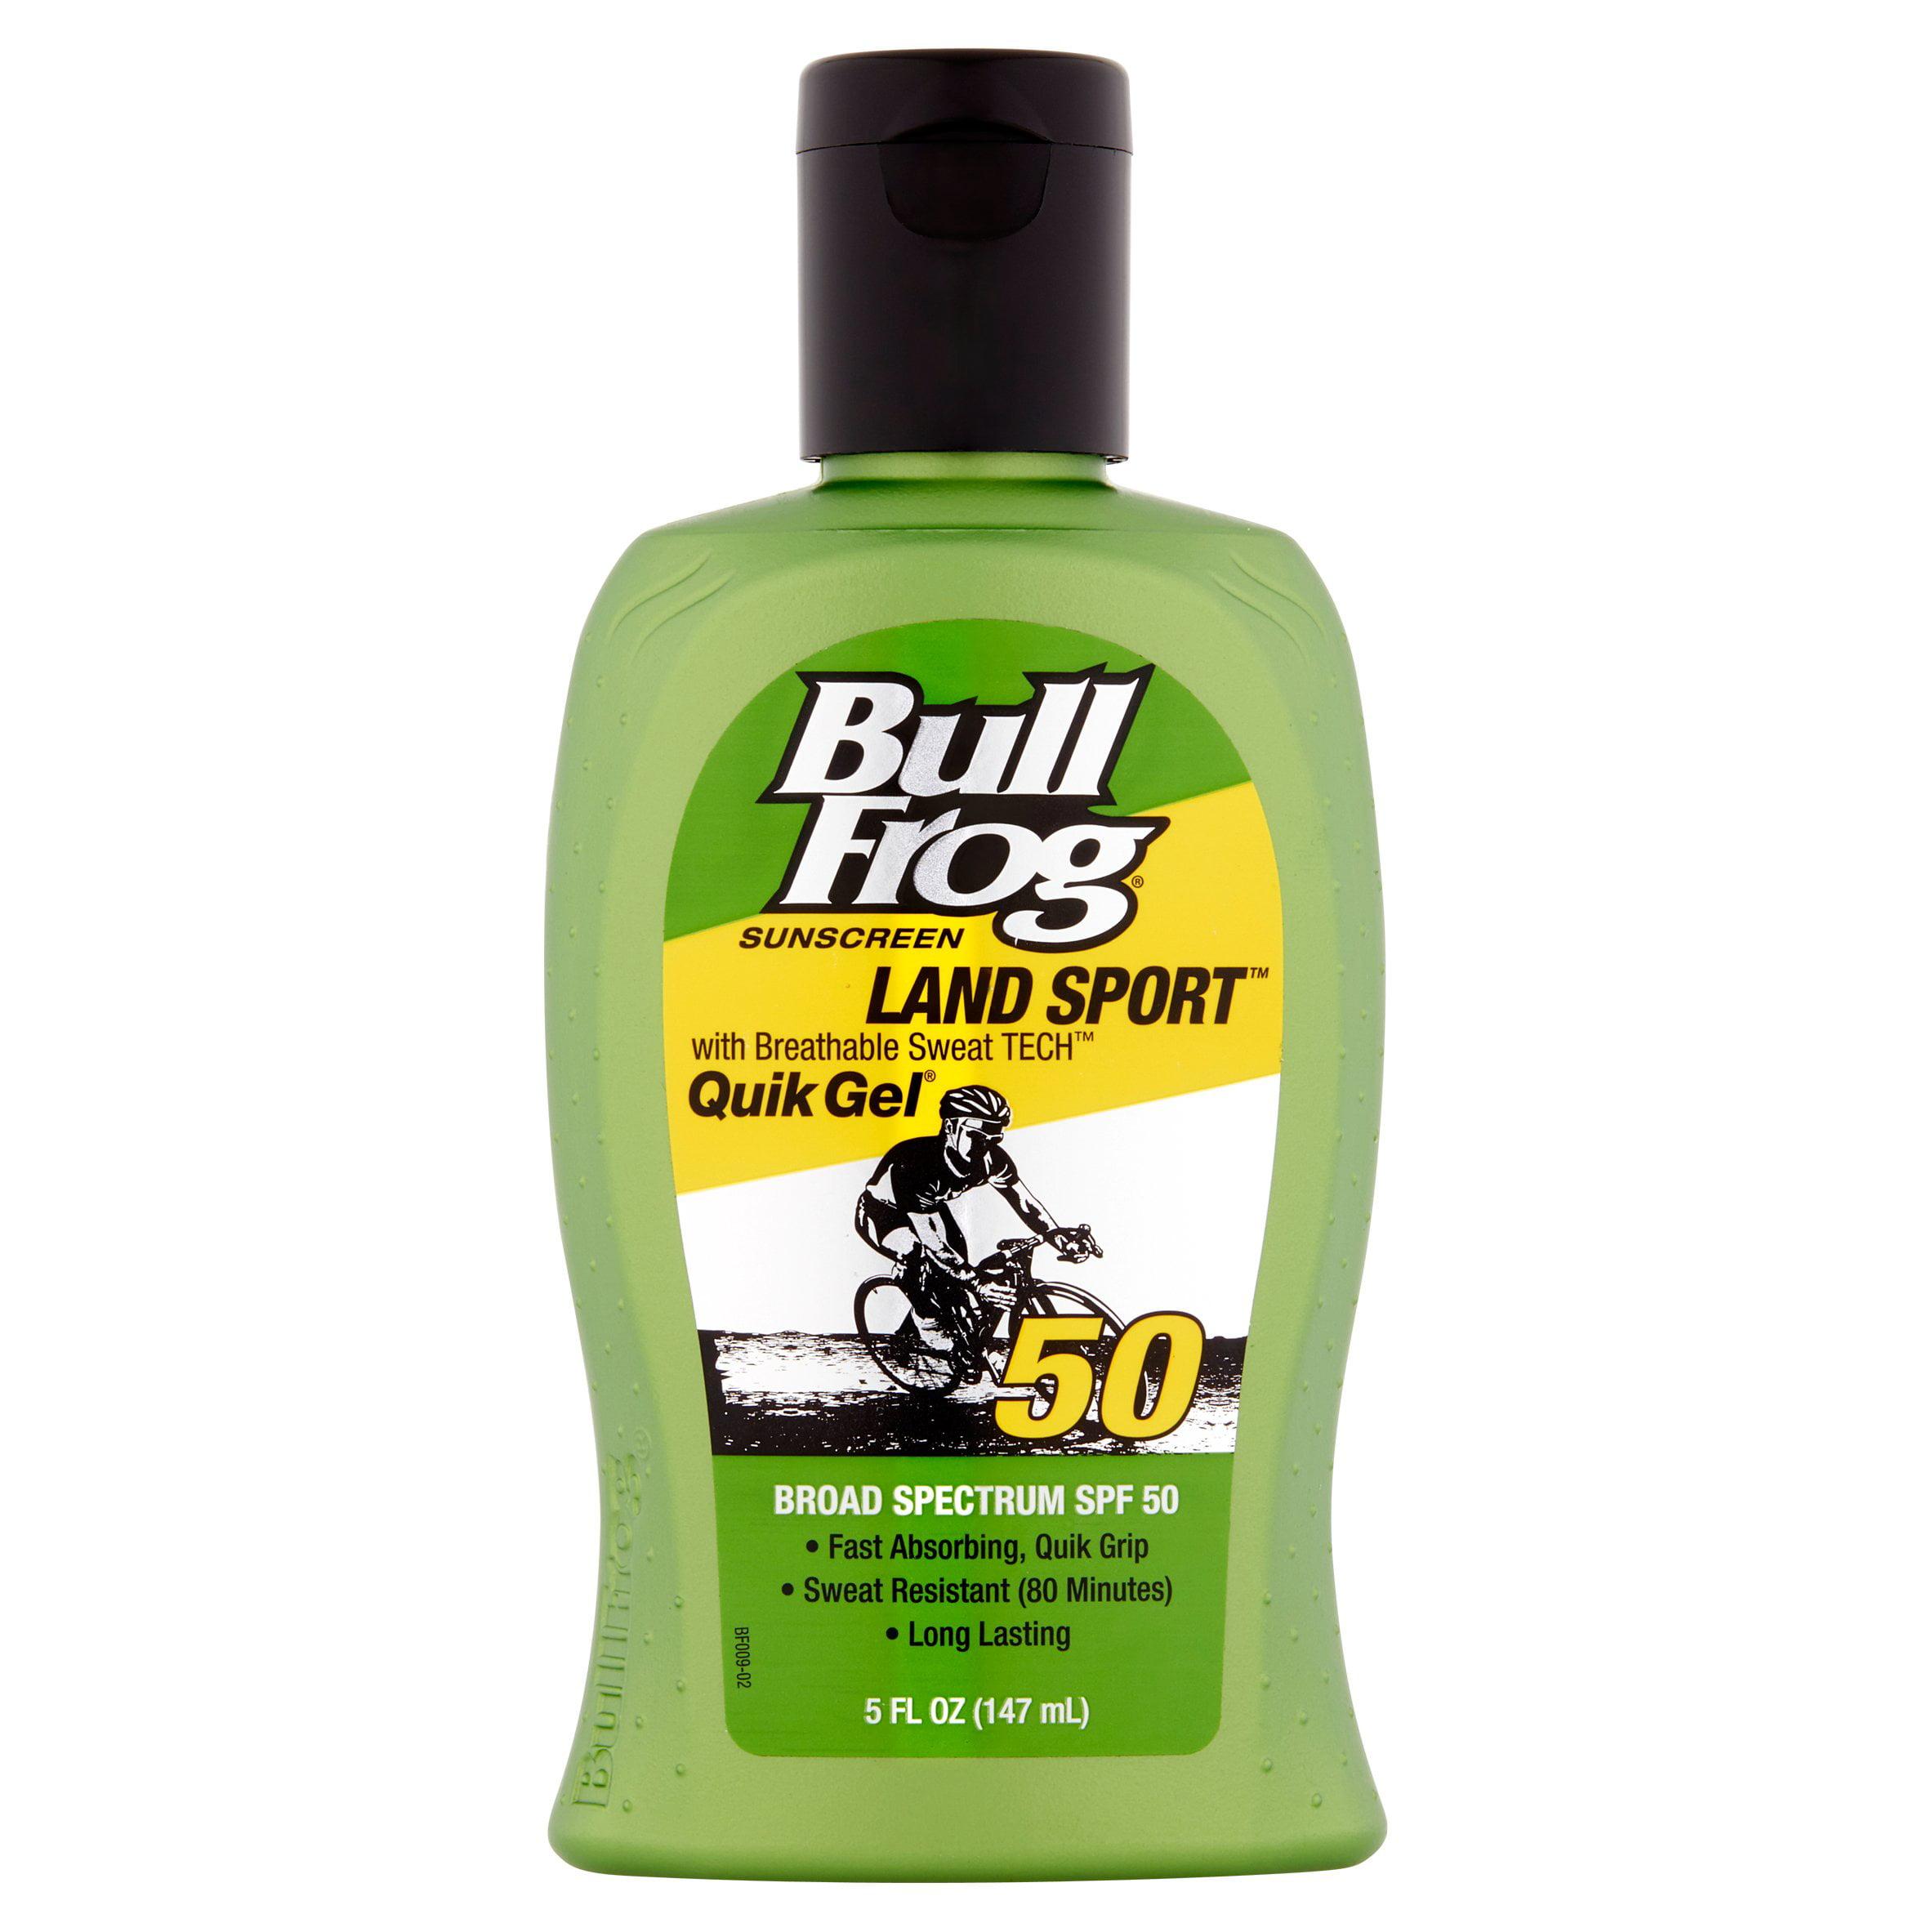 Bull Frog Land Sport Quik Gel Sunscreen Broad Spectrum, SPF 50, 5 fl oz